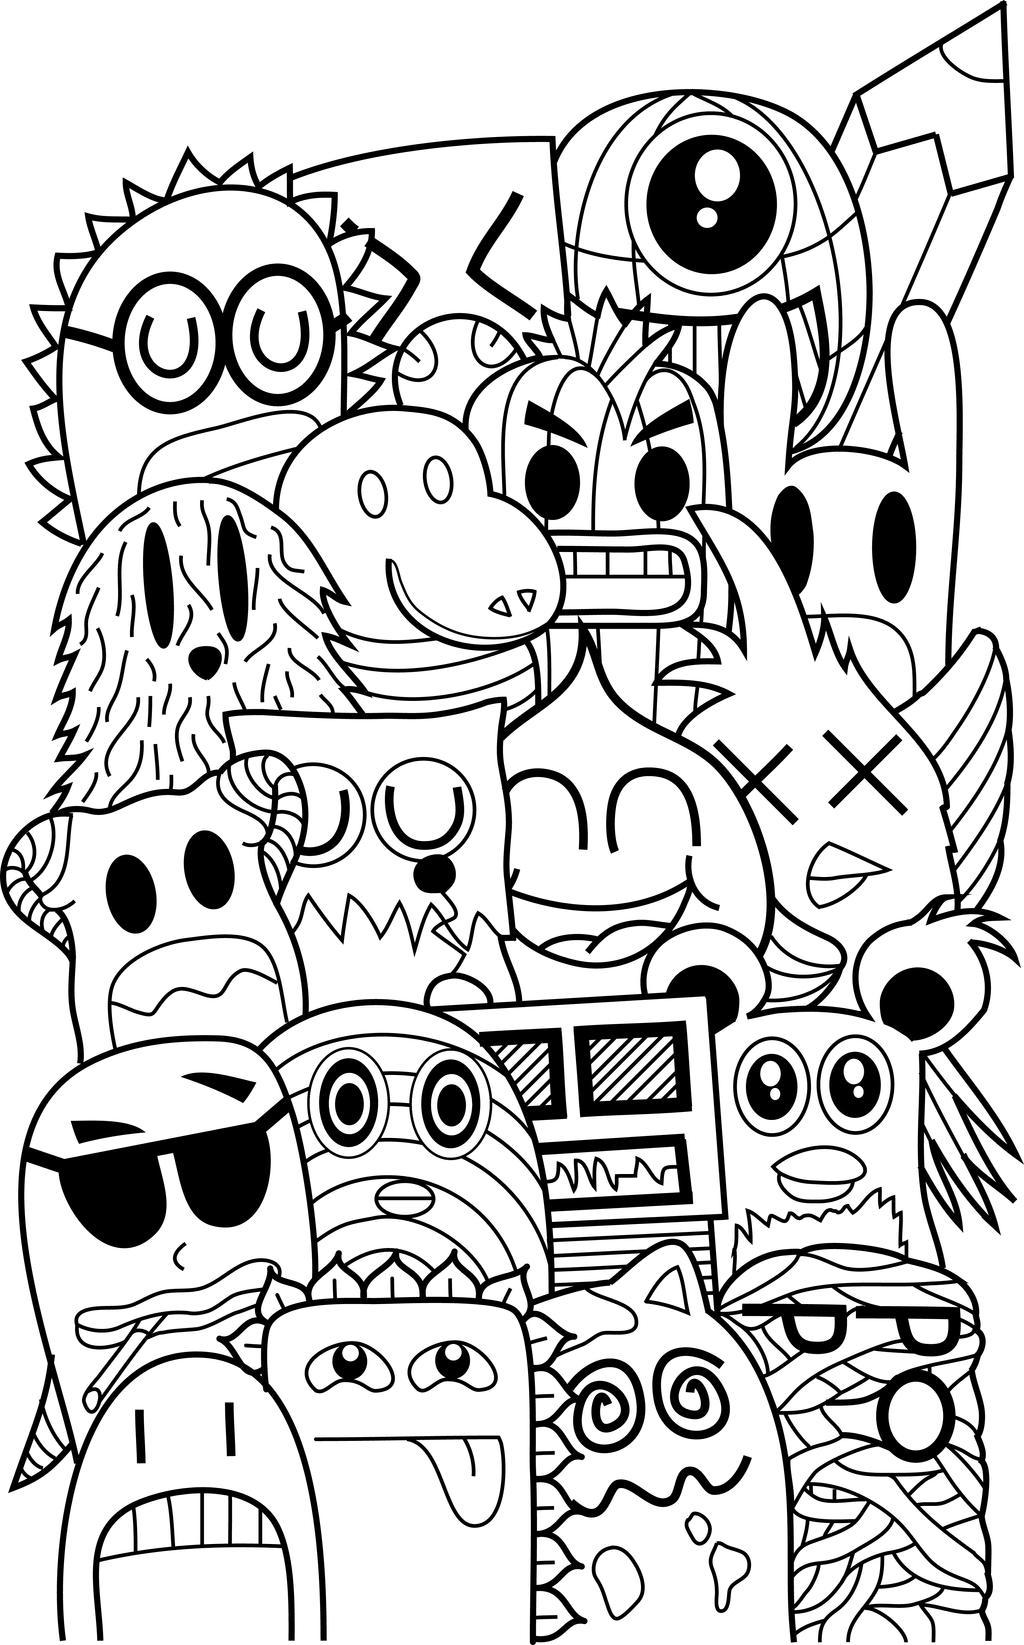 Doodle Friends By Byfrankkk On DeviantArt